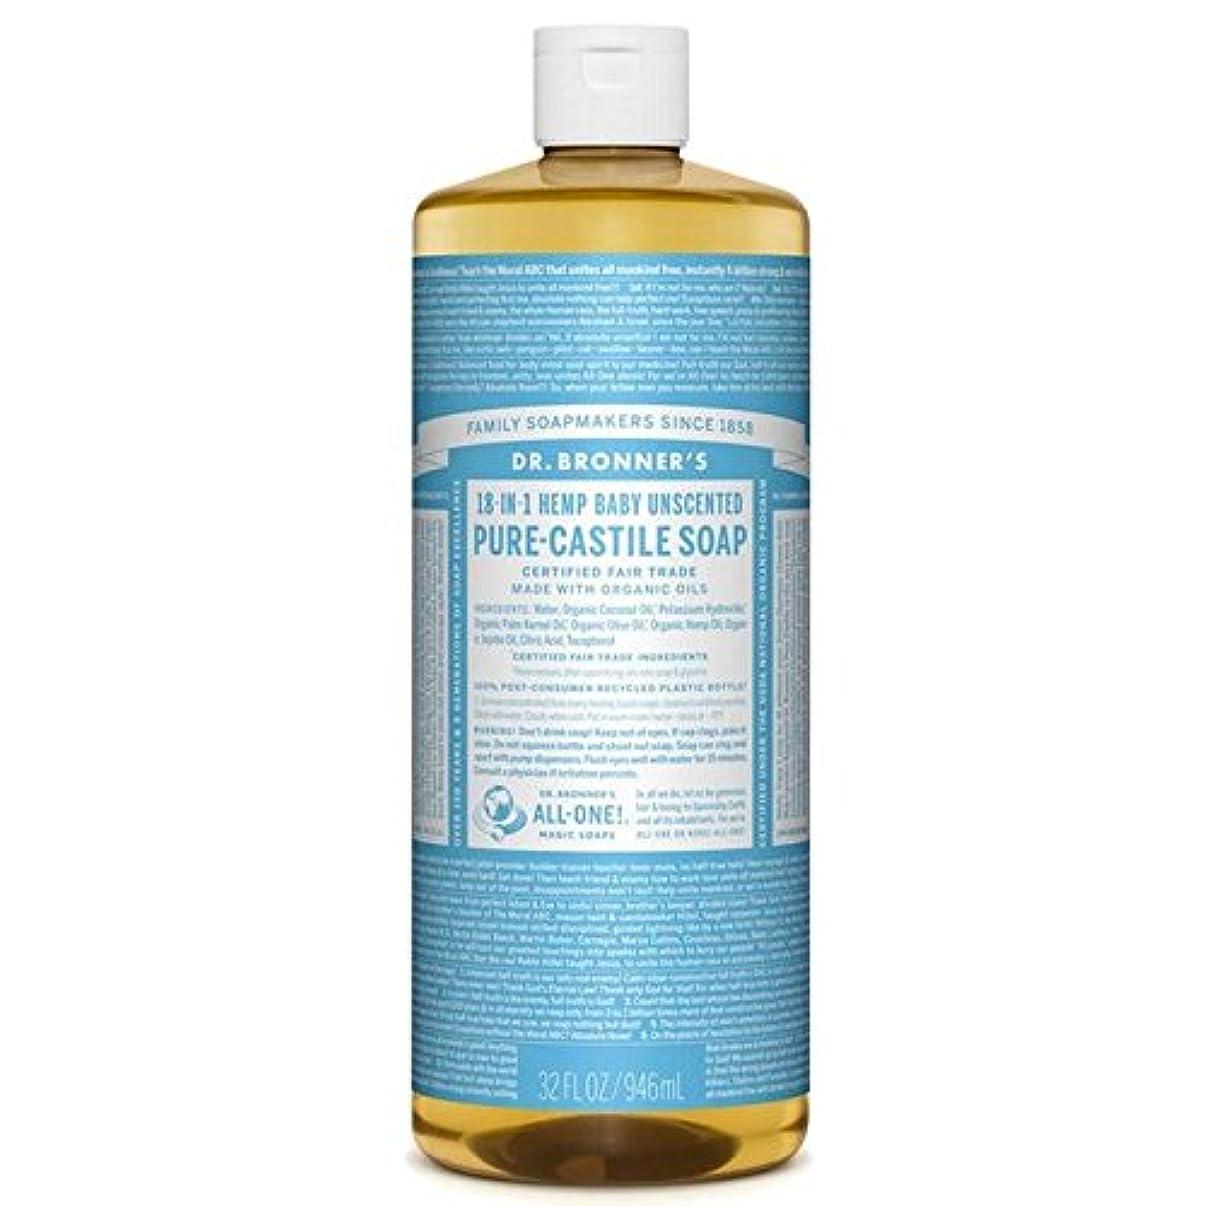 Dr Bronner Organic Baby Mild Castile Liquid Soap 946ml - のブロナーオーガニックベビーマイルドなカスティーリャ液体石鹸946ミリリットル [並行輸入品]